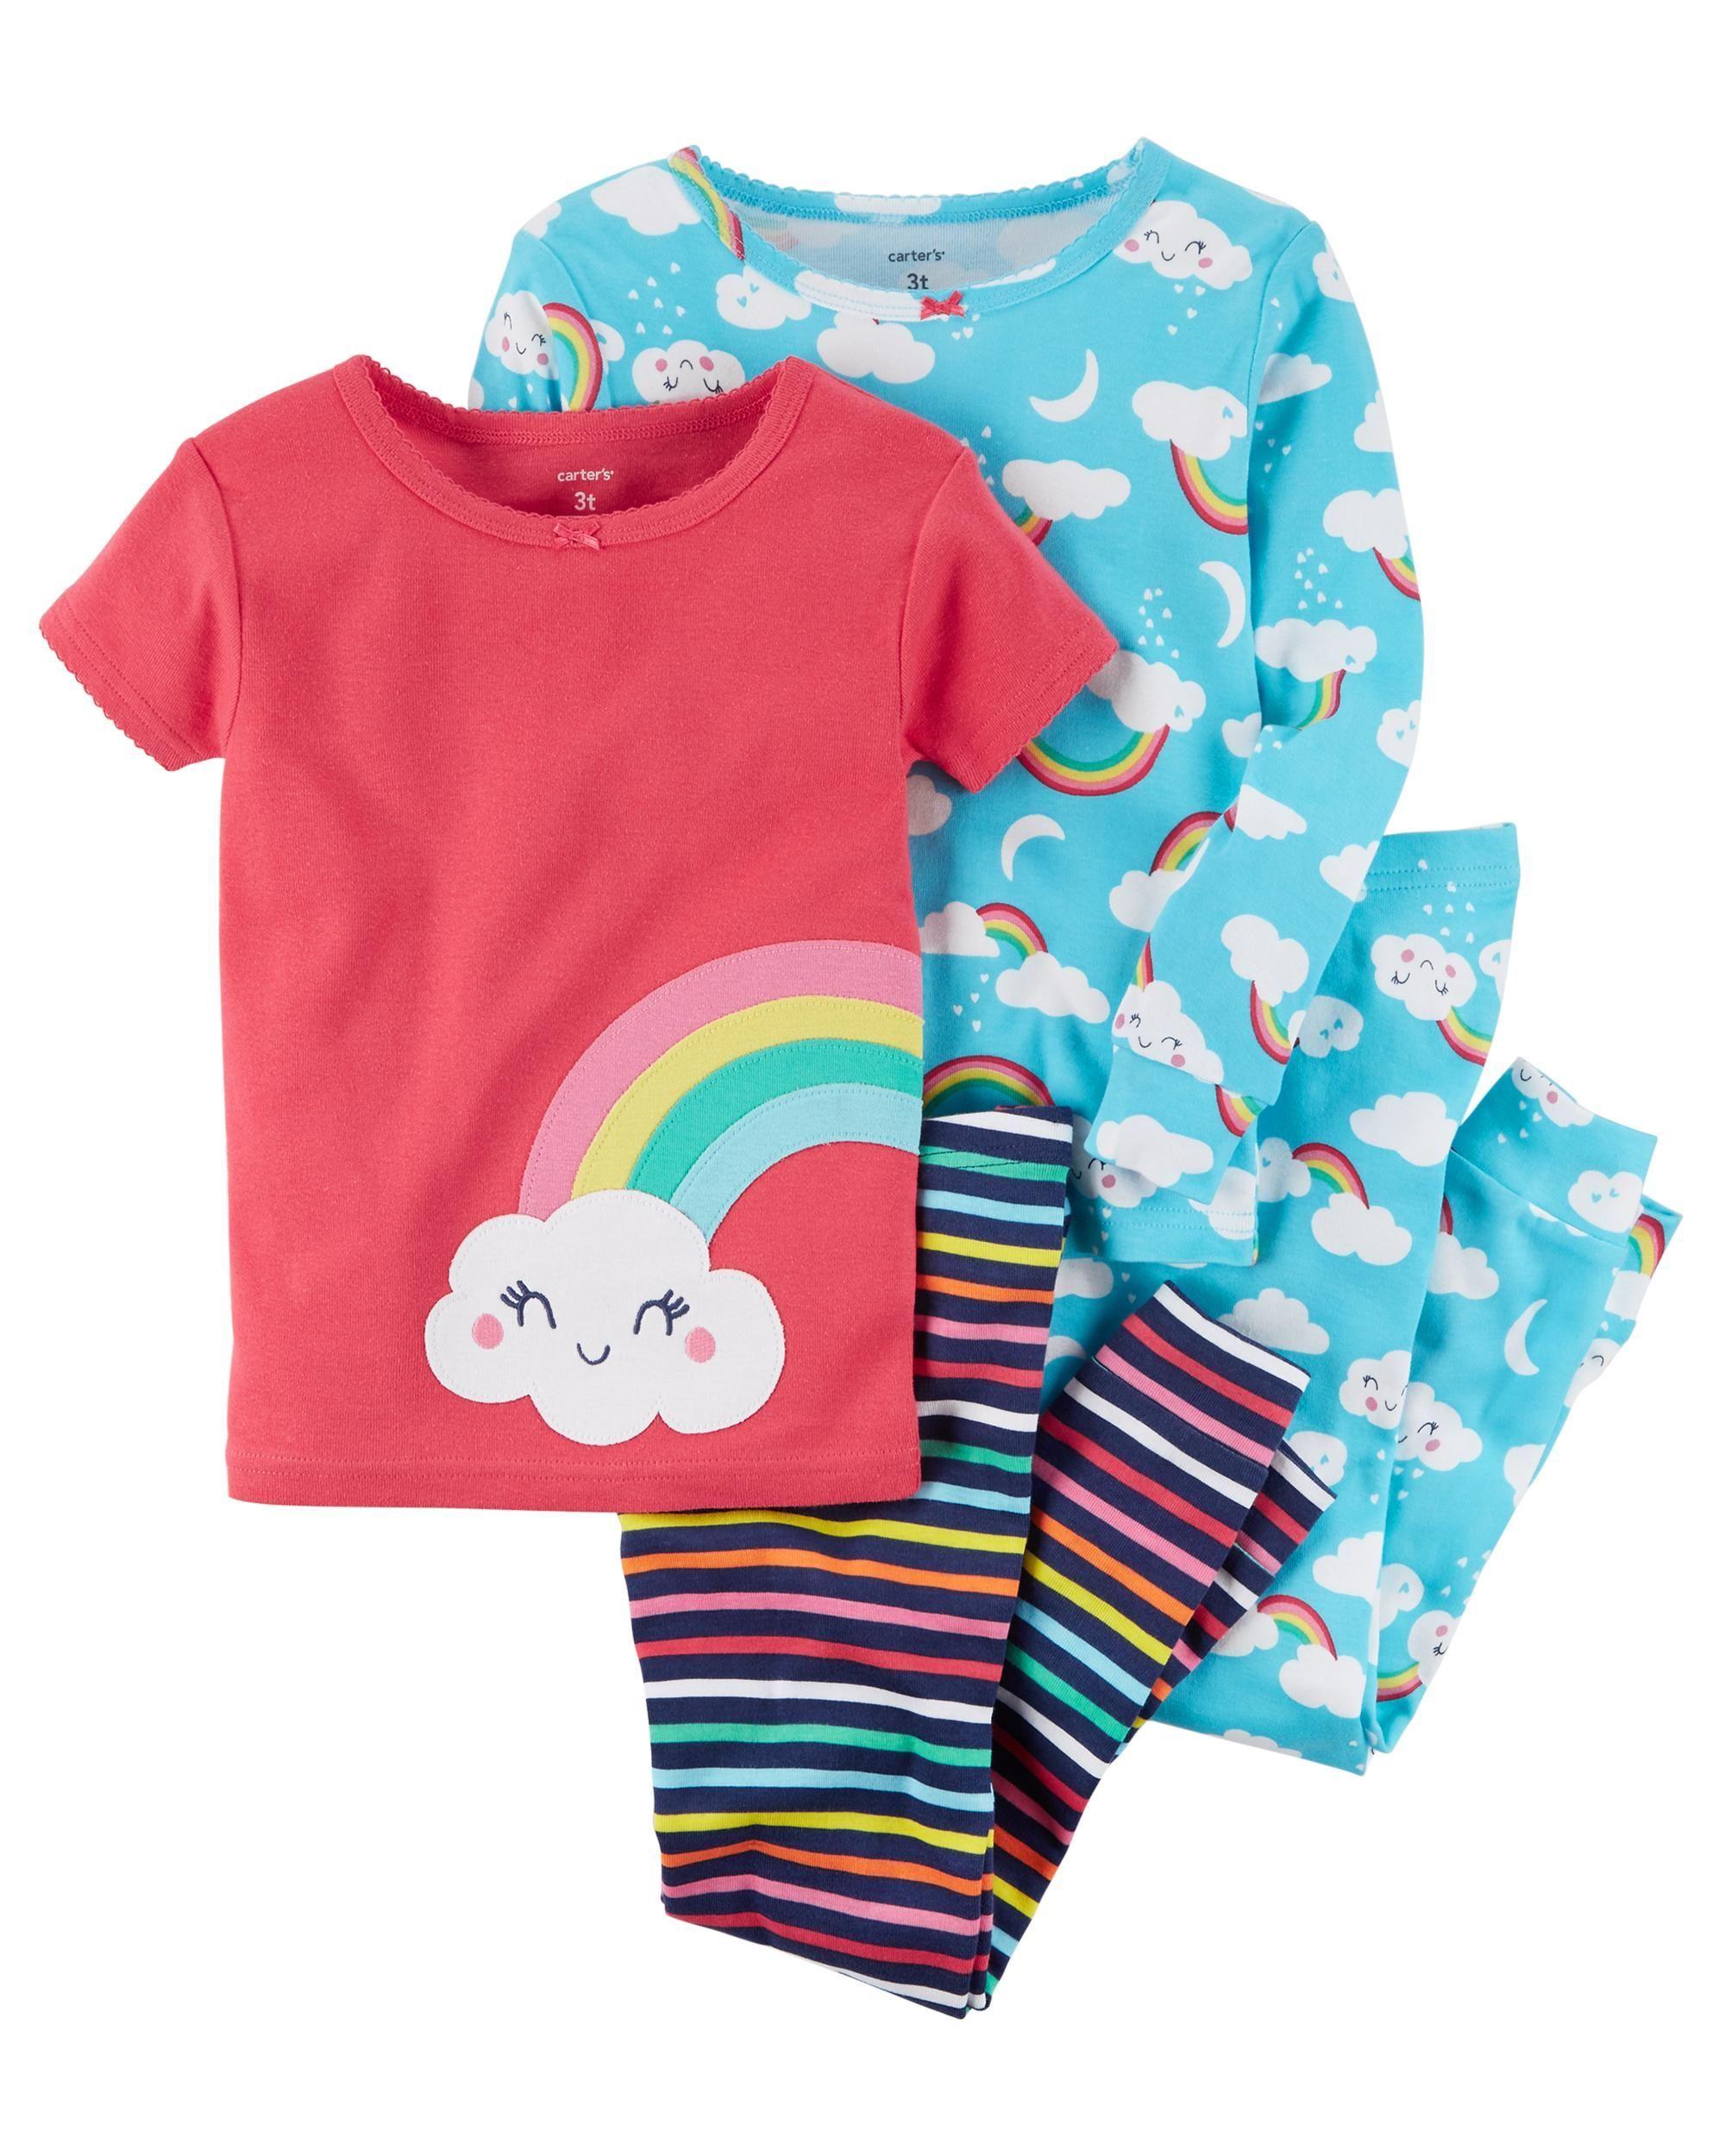 757ee9429 4-Piece Rainbow Snug Fit Cotton PJs